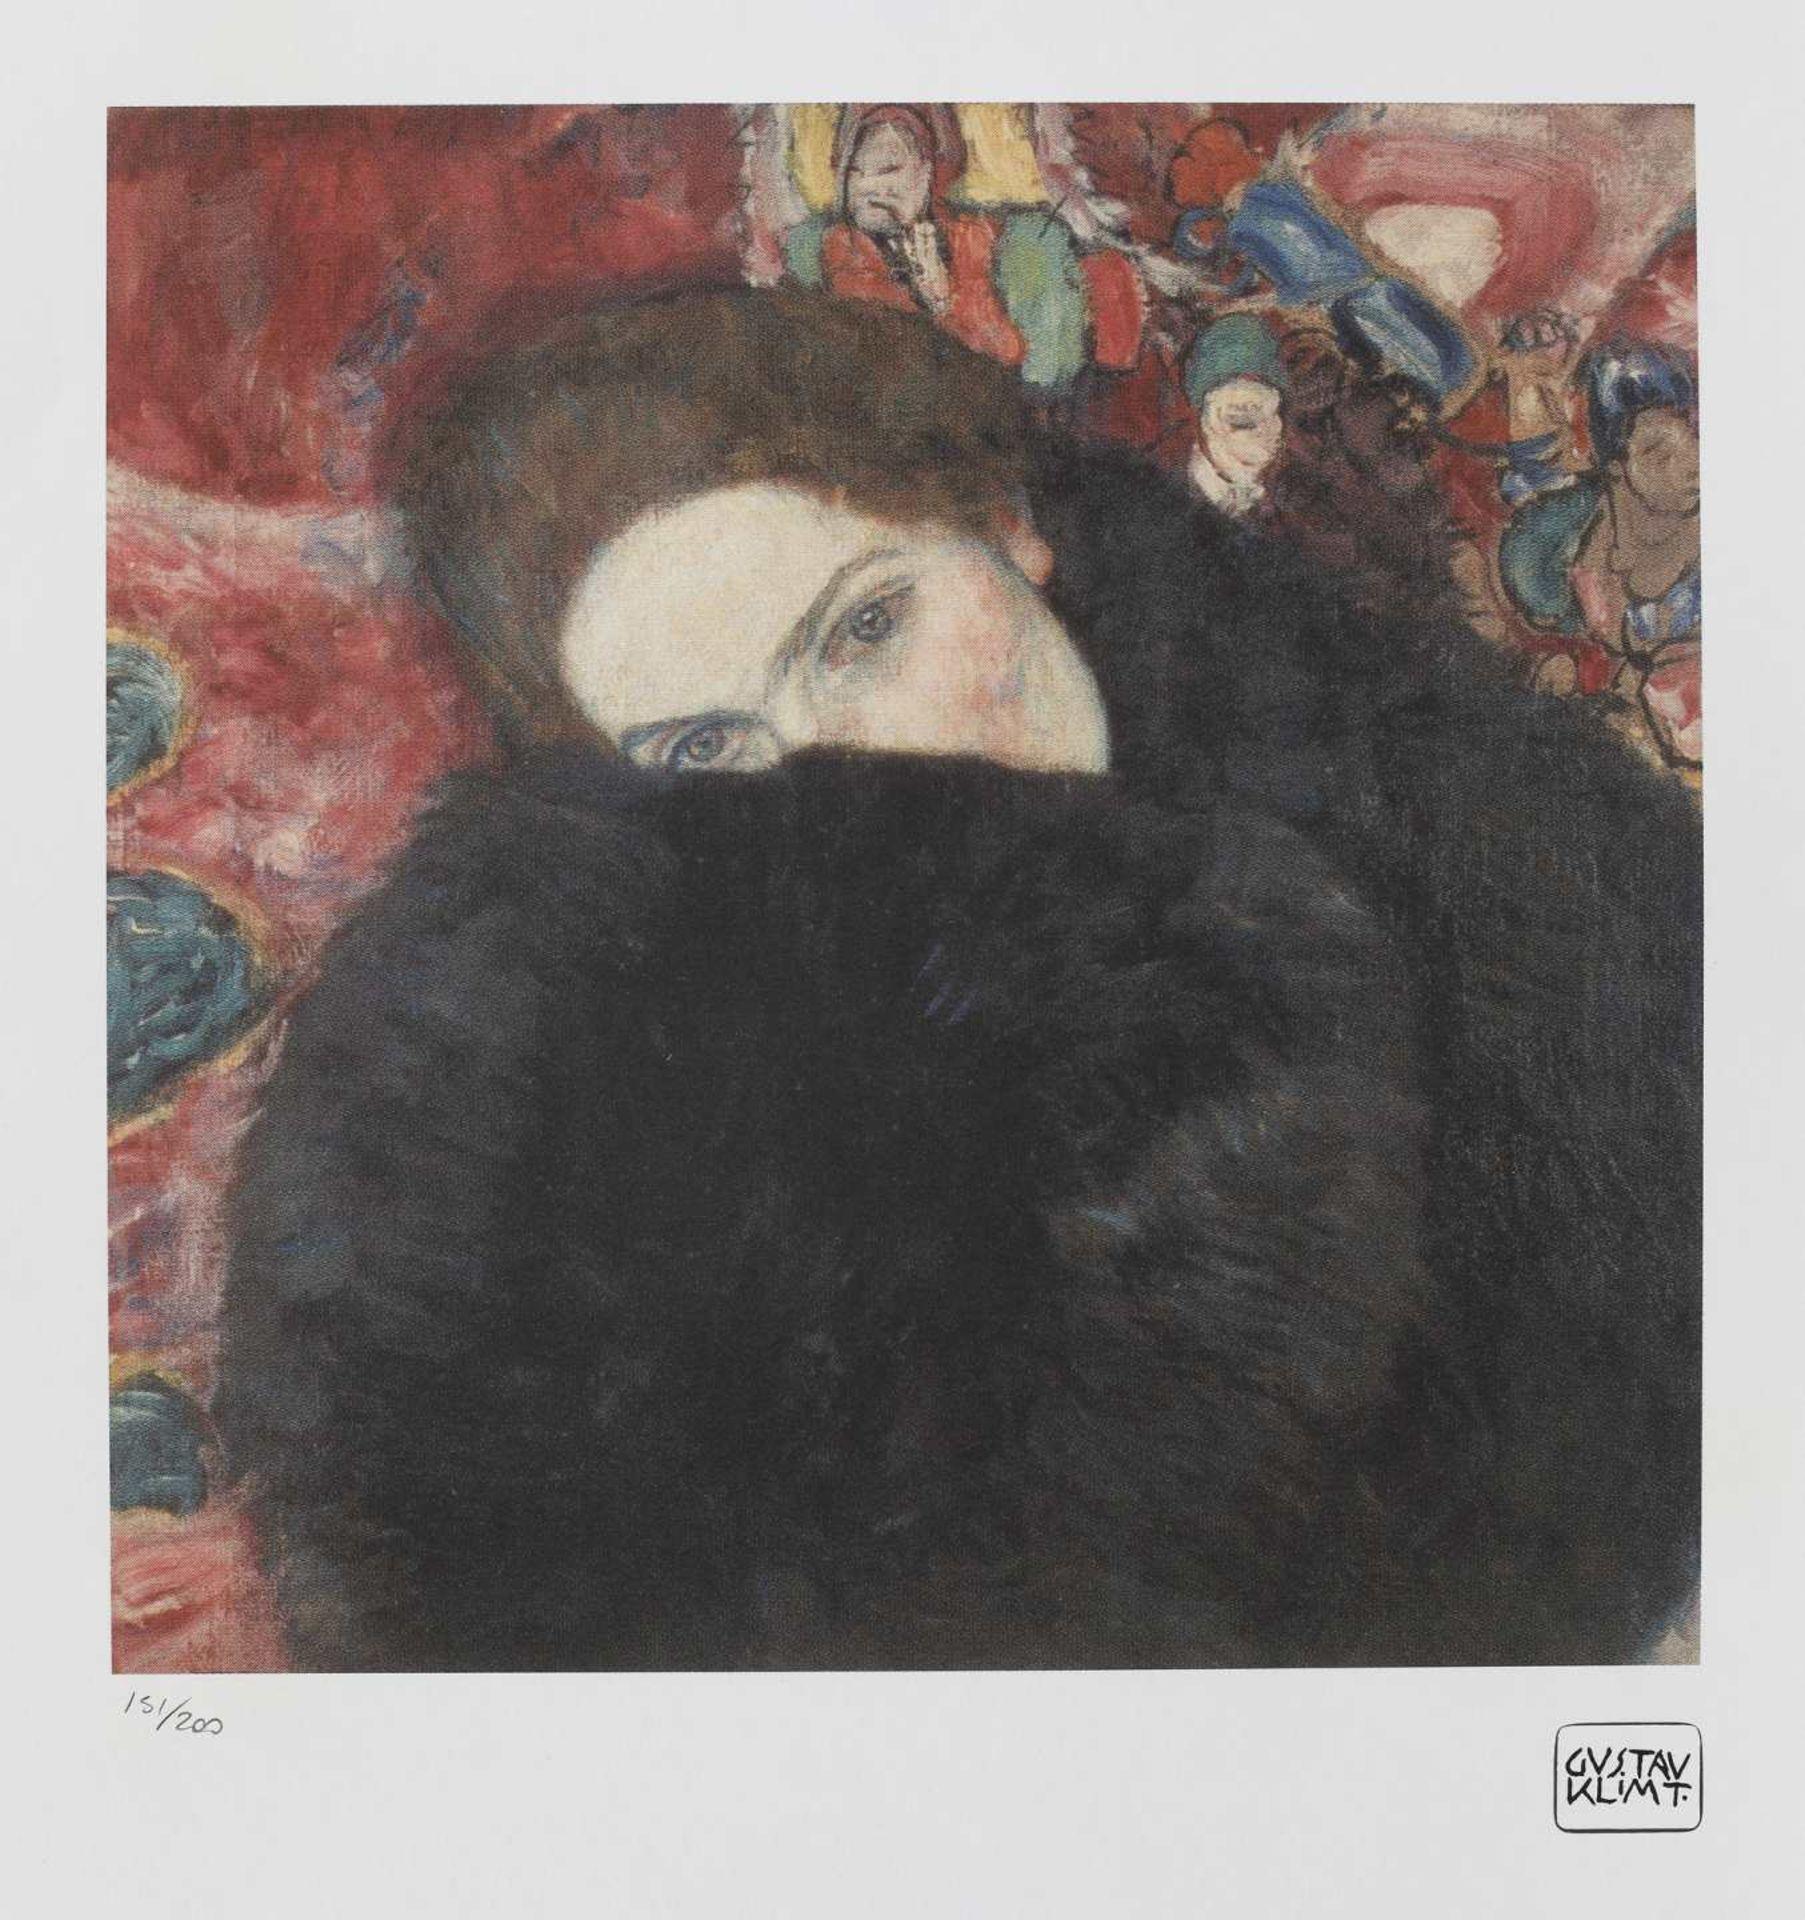 Gustav Klimt, Lady with a MuffGustav Klimt, Lady with a Muff, chromolithography, 34,5 × 45,5 c